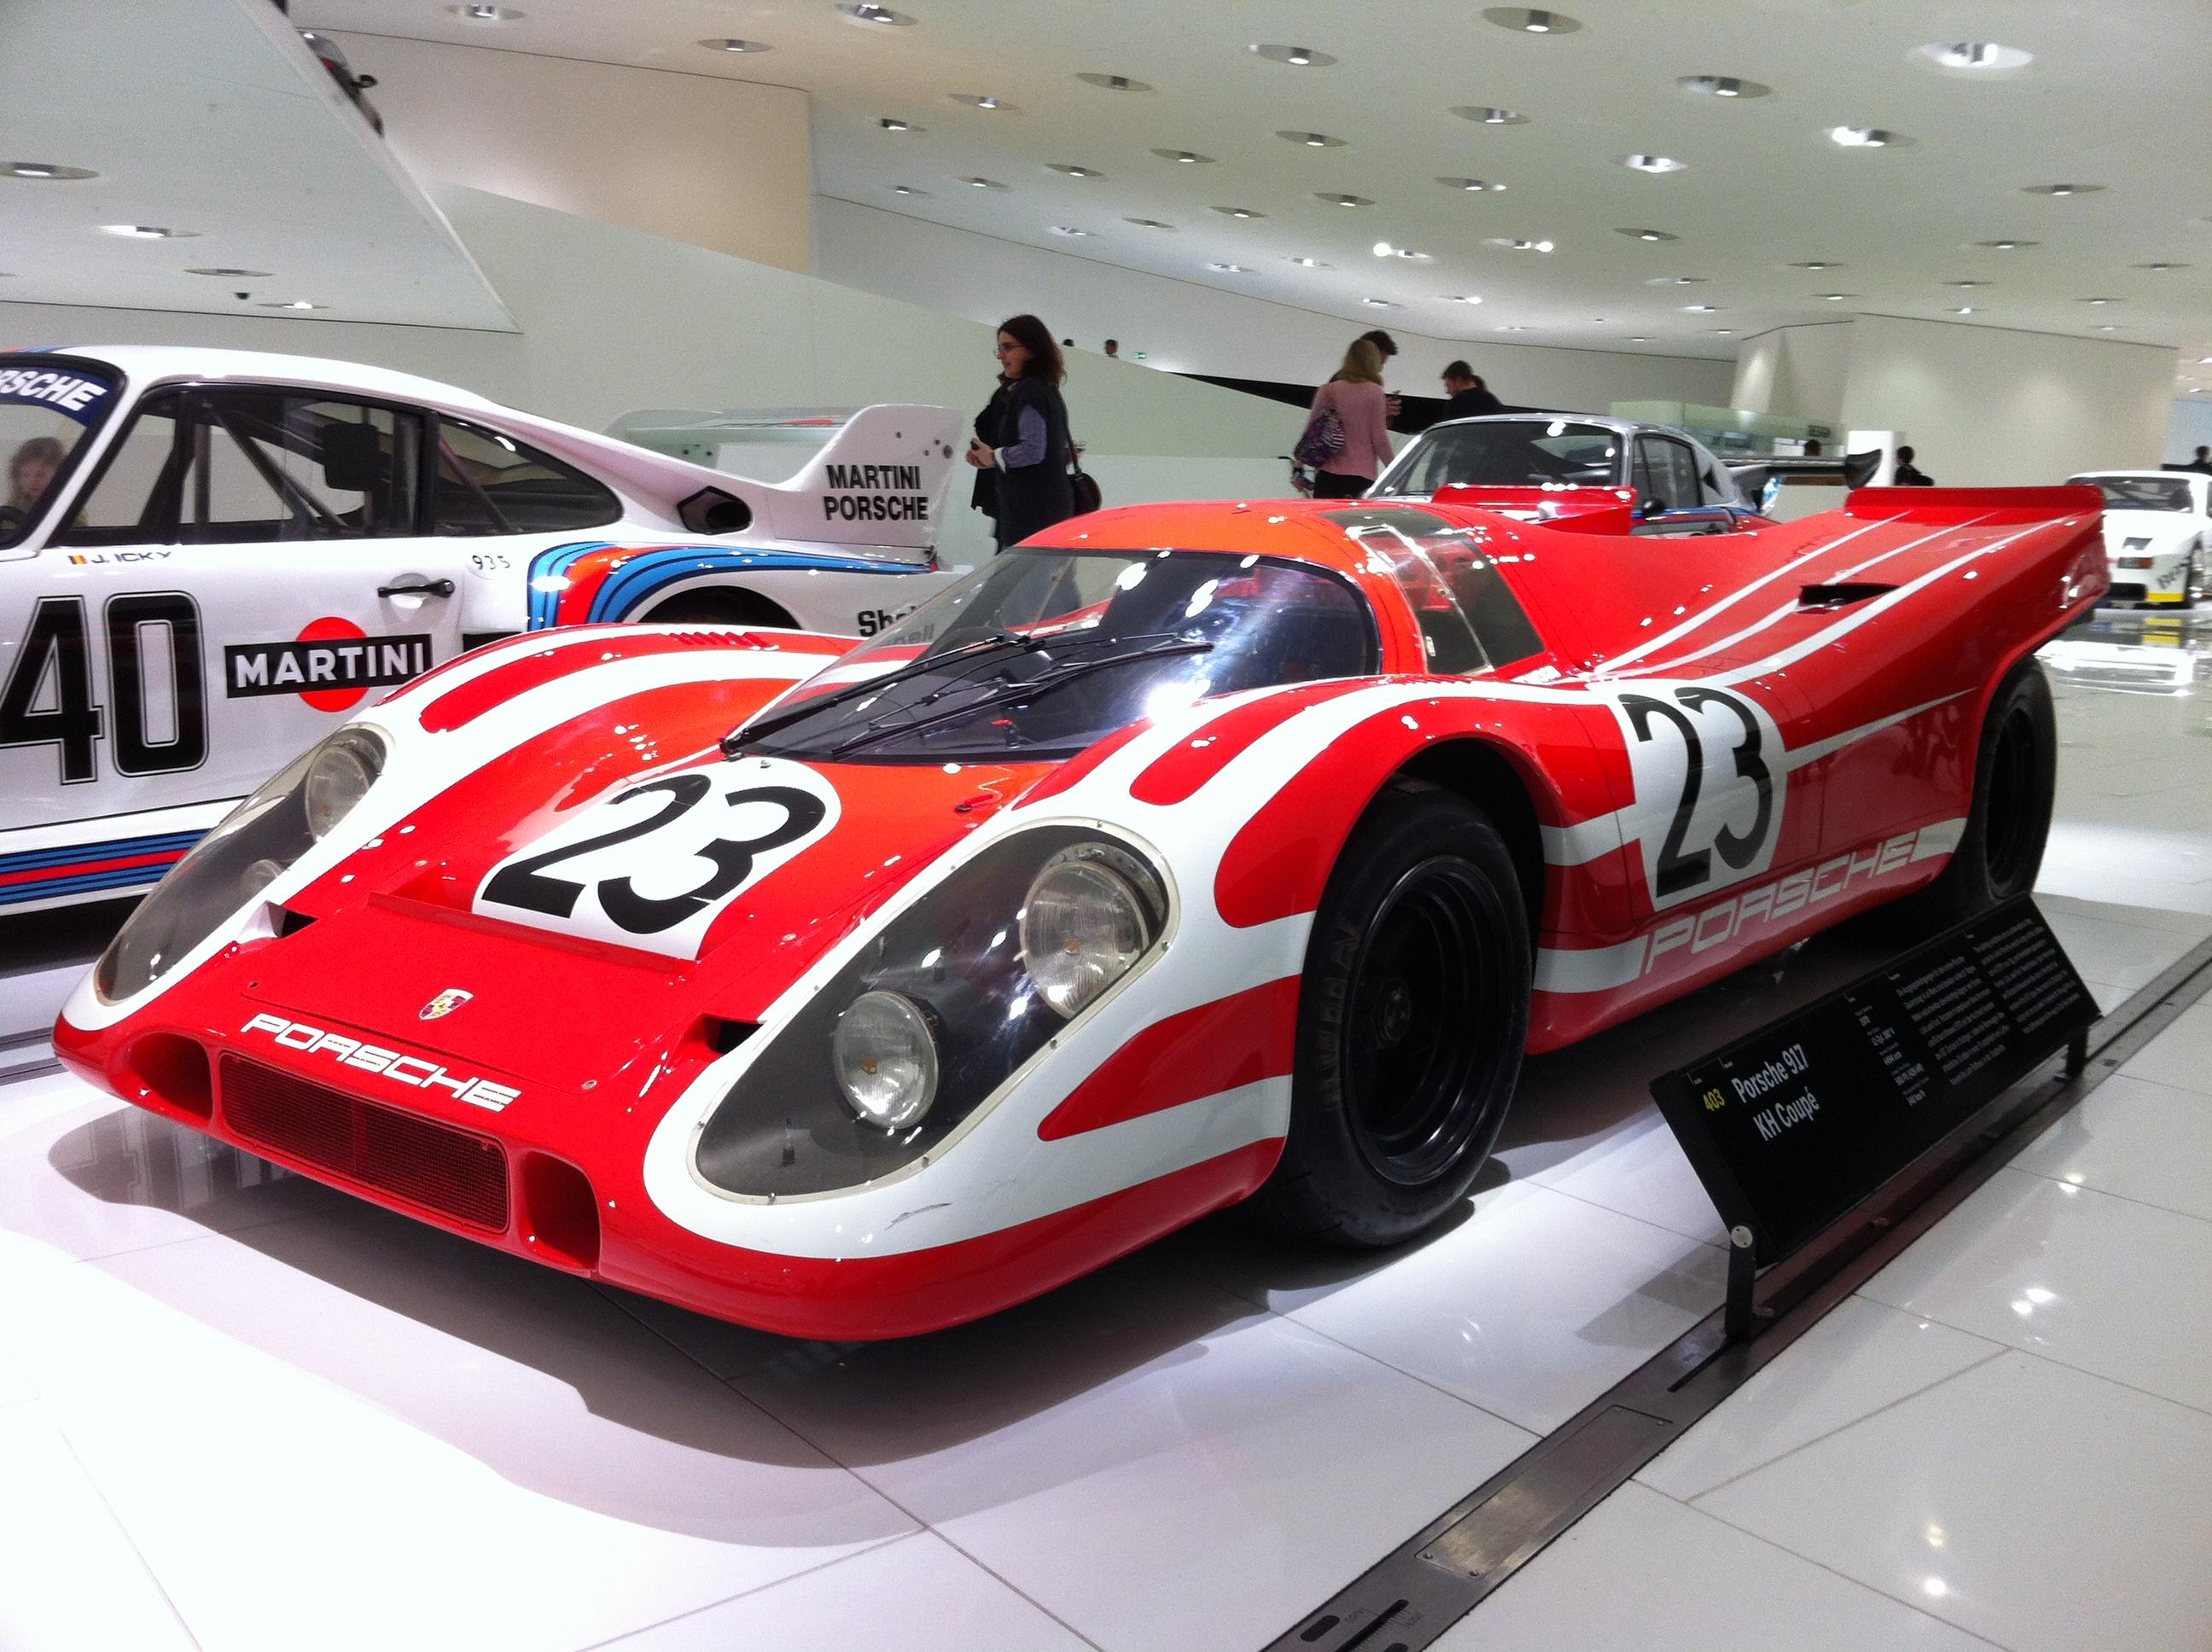 Porsche 917 Morewheelspin